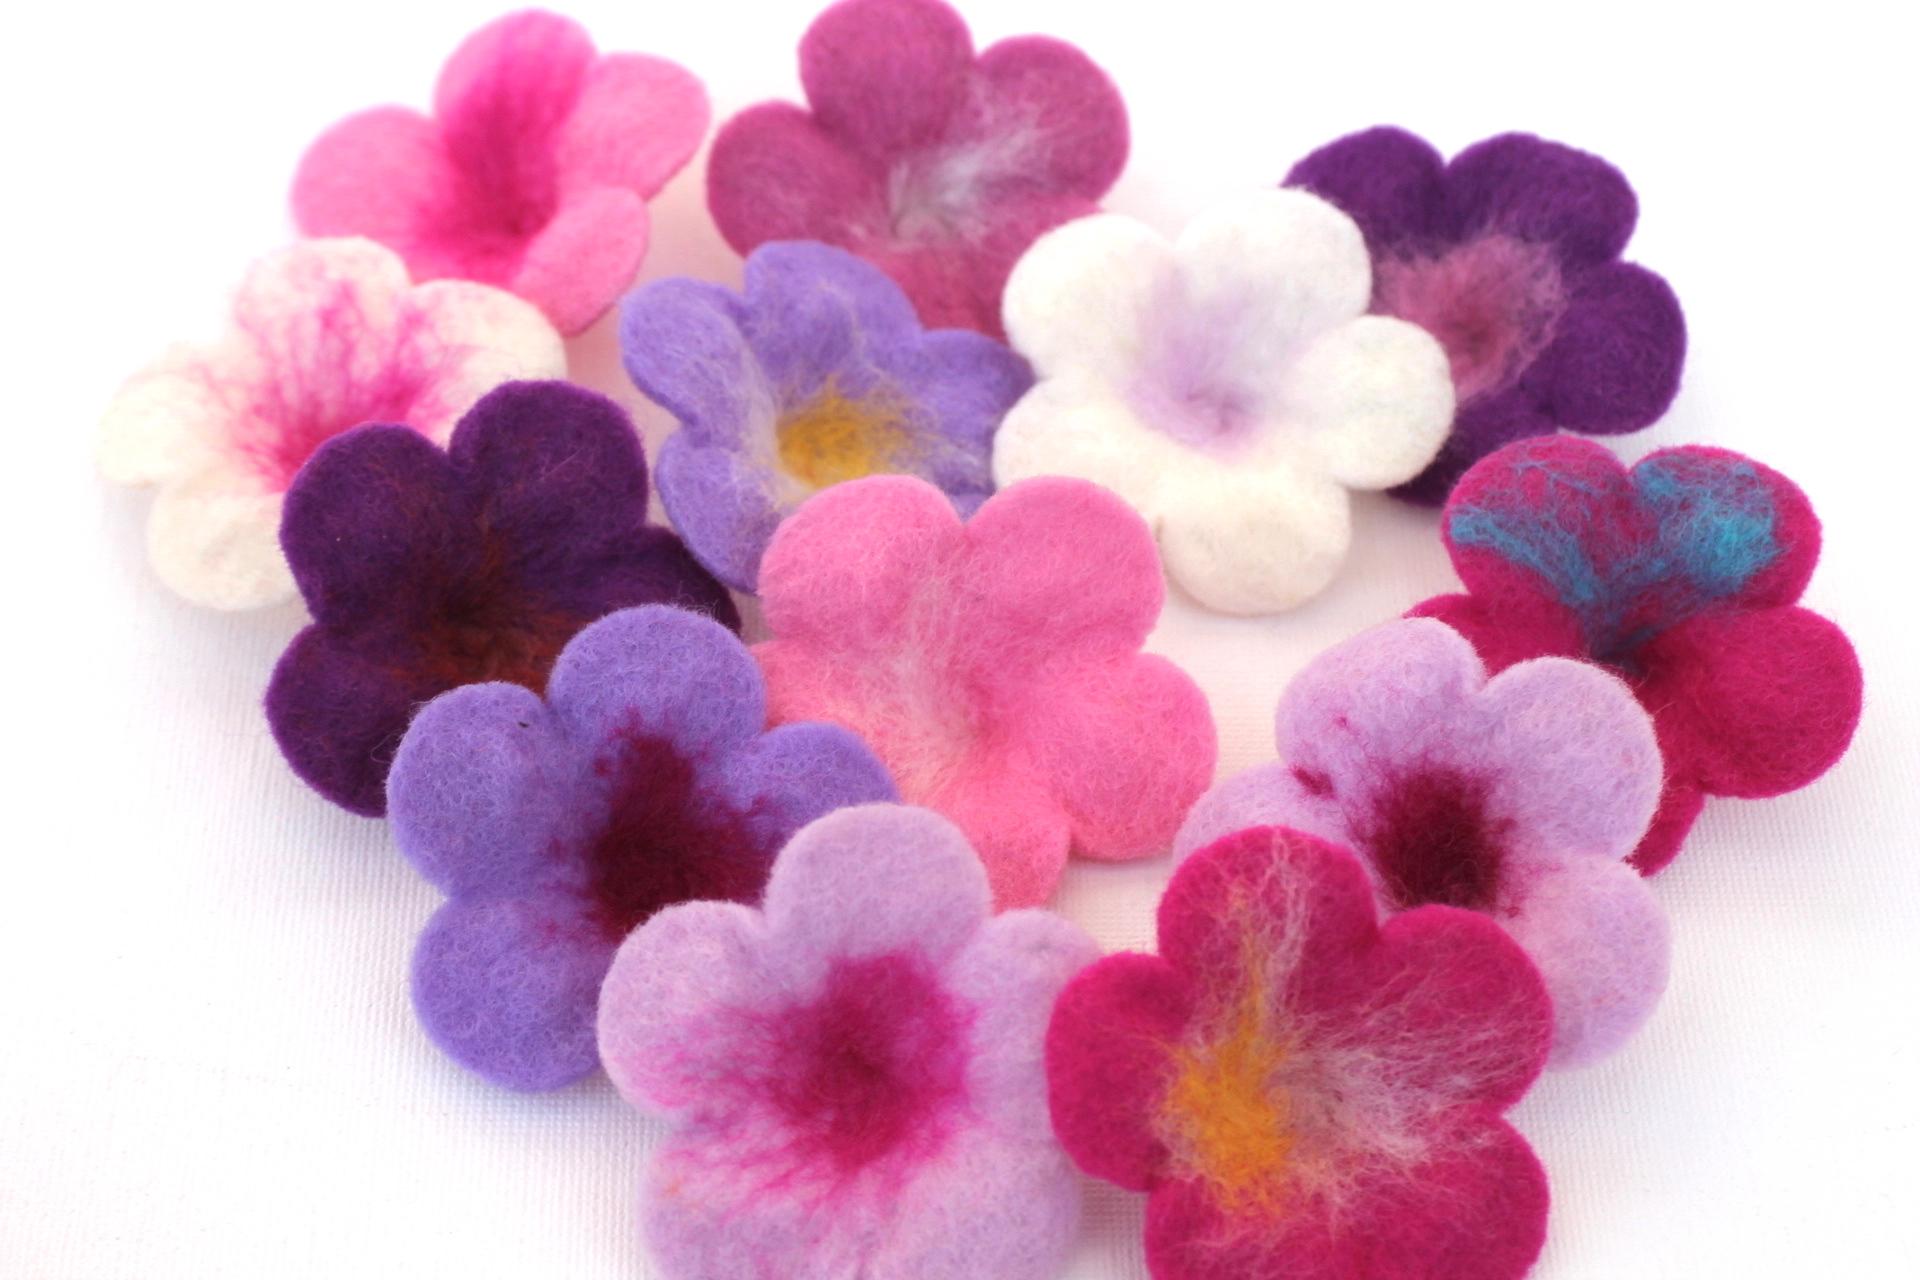 Mafiz.de flowers applique flower application tinker flowers